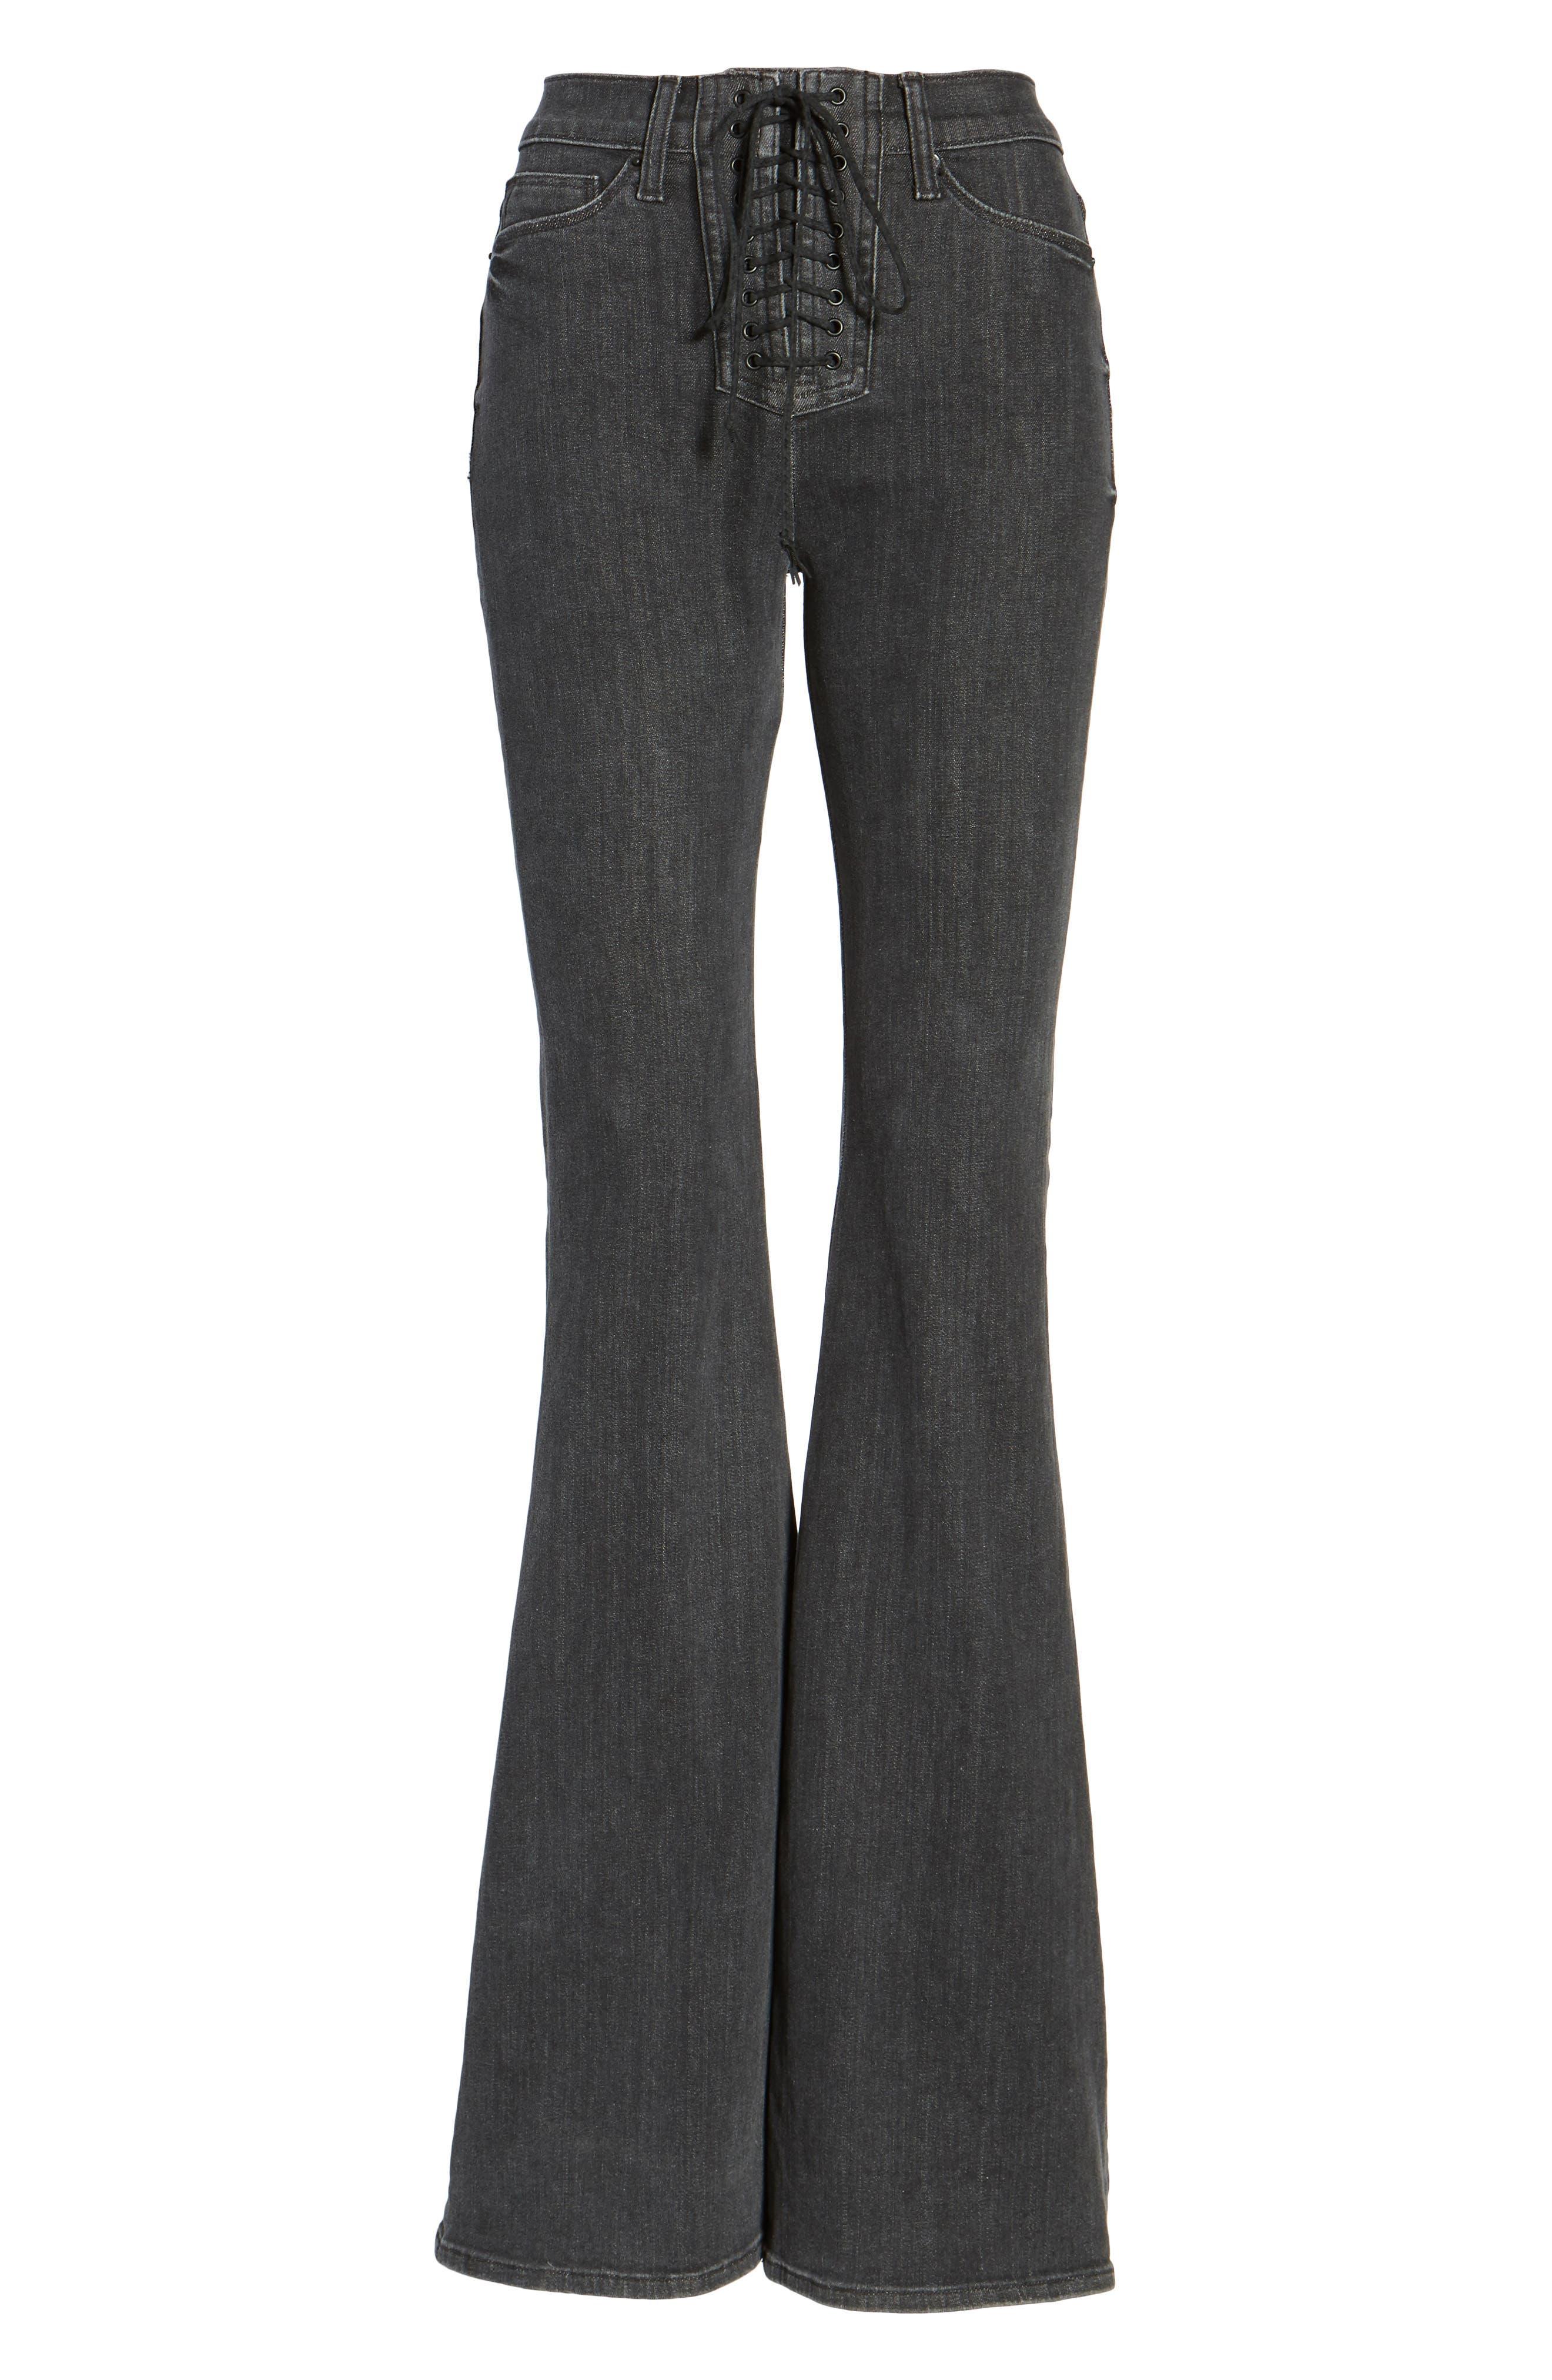 Bullocks High Waist Lace-Up Flare Jeans,                             Alternate thumbnail 6, color,                             064